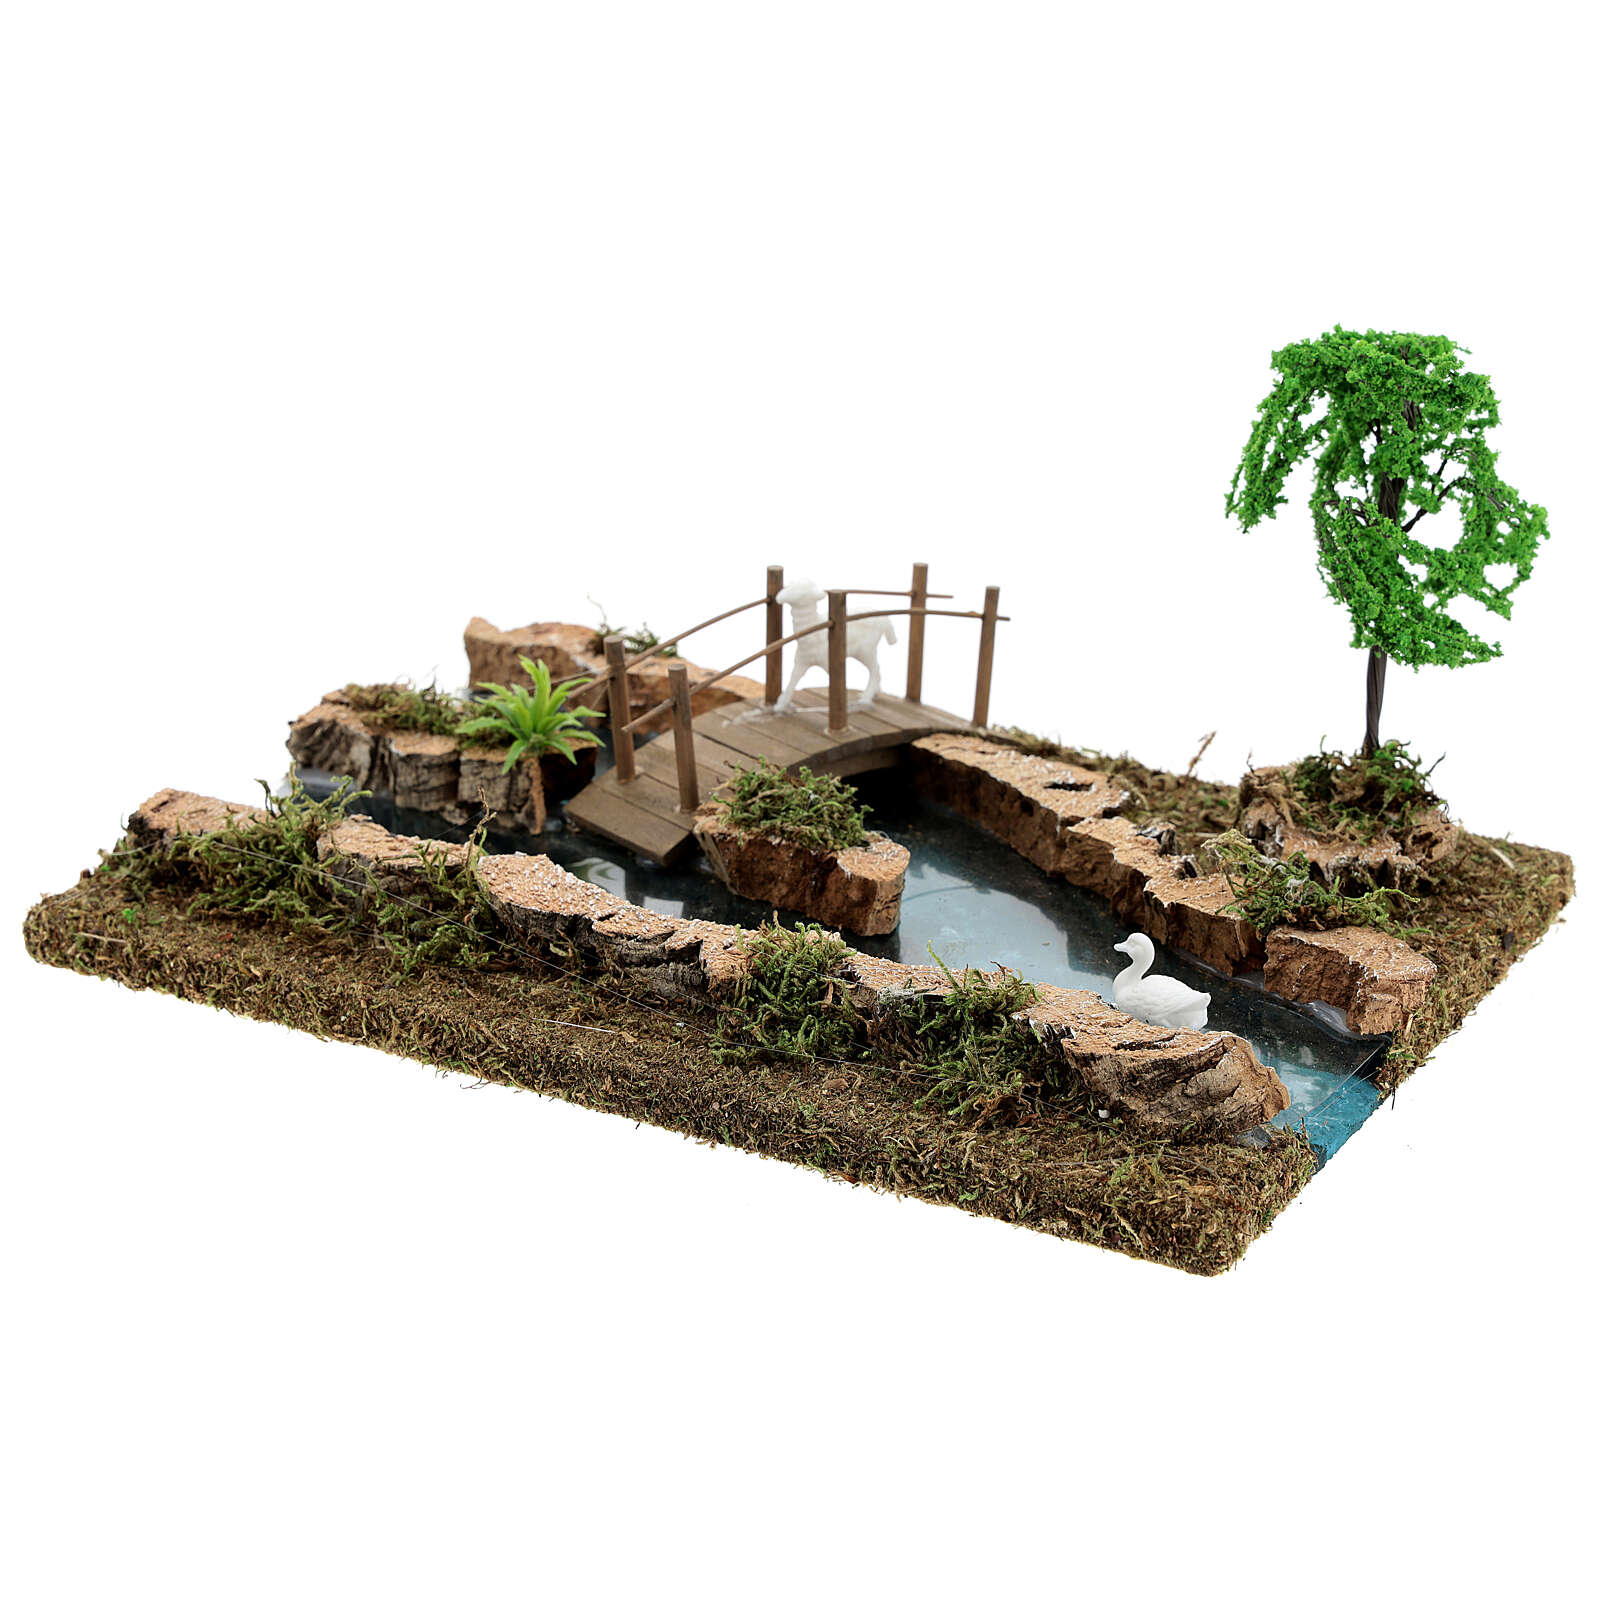 Modular river bridge and animals 12x26x18 cm nativity scenes 6-8 cm 4